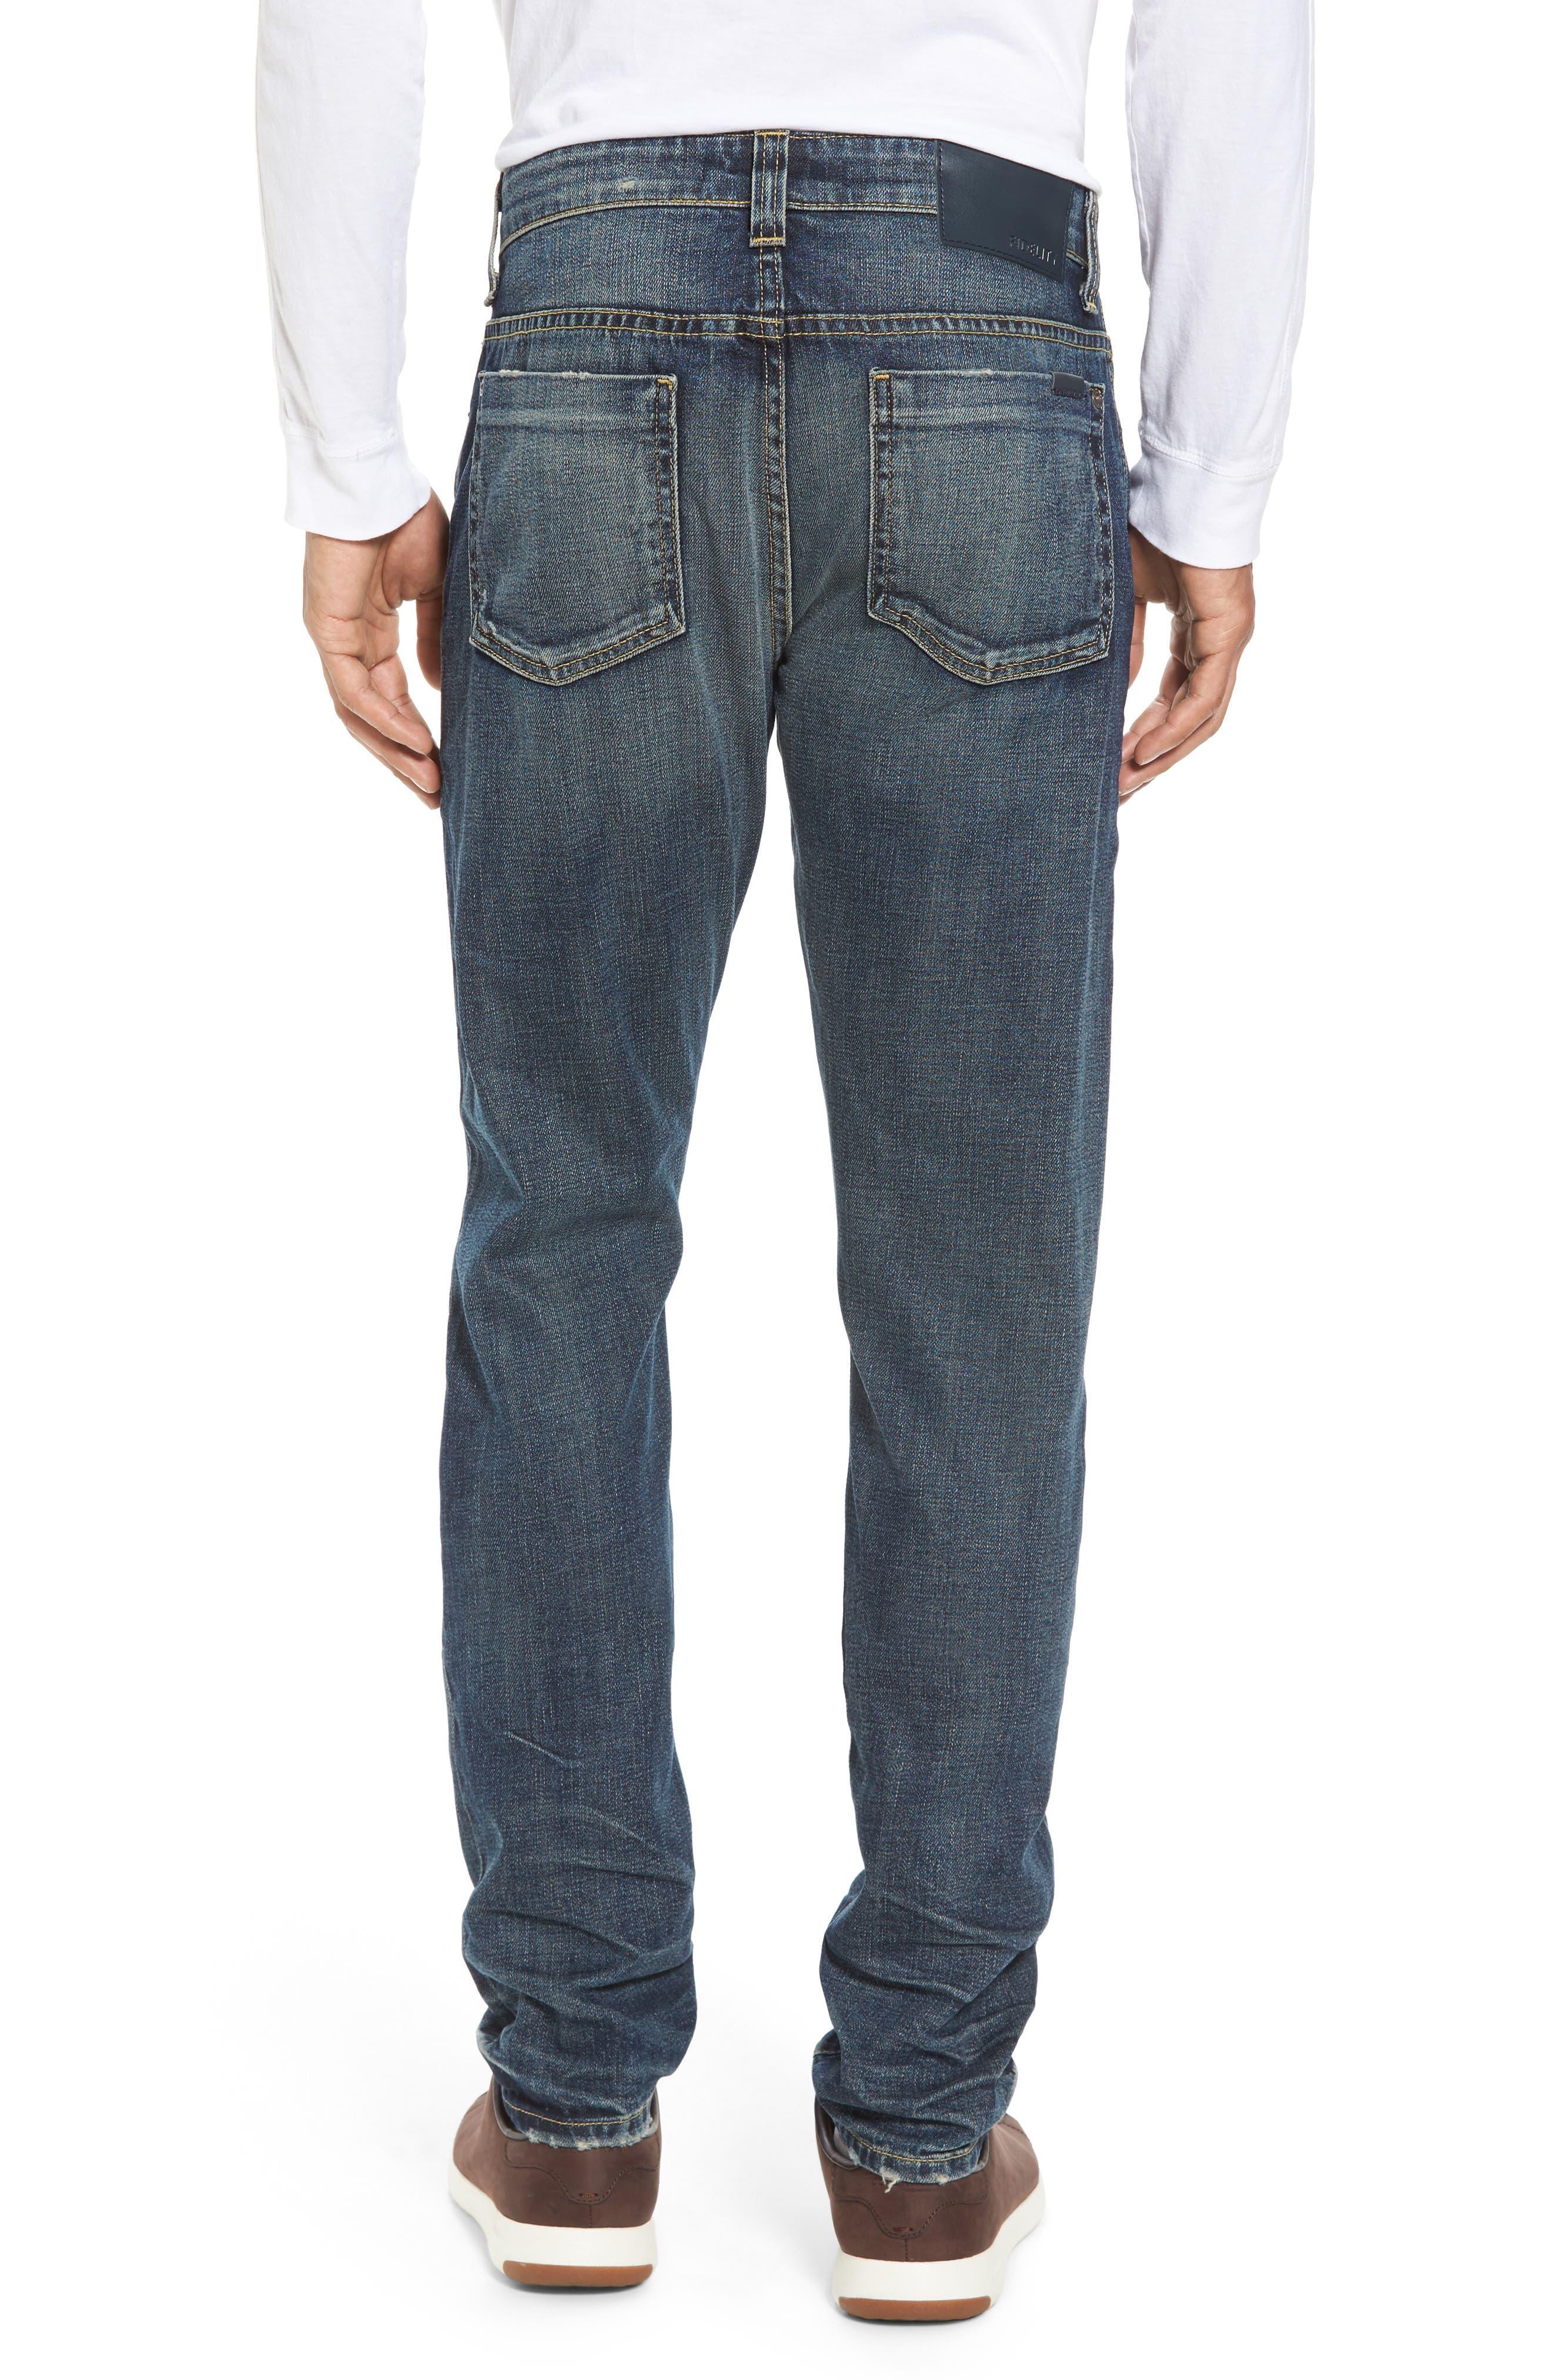 Fideltiy Denim Torino Slim Fit Jeans,                             Alternate thumbnail 2, color,                             Crystal Blue